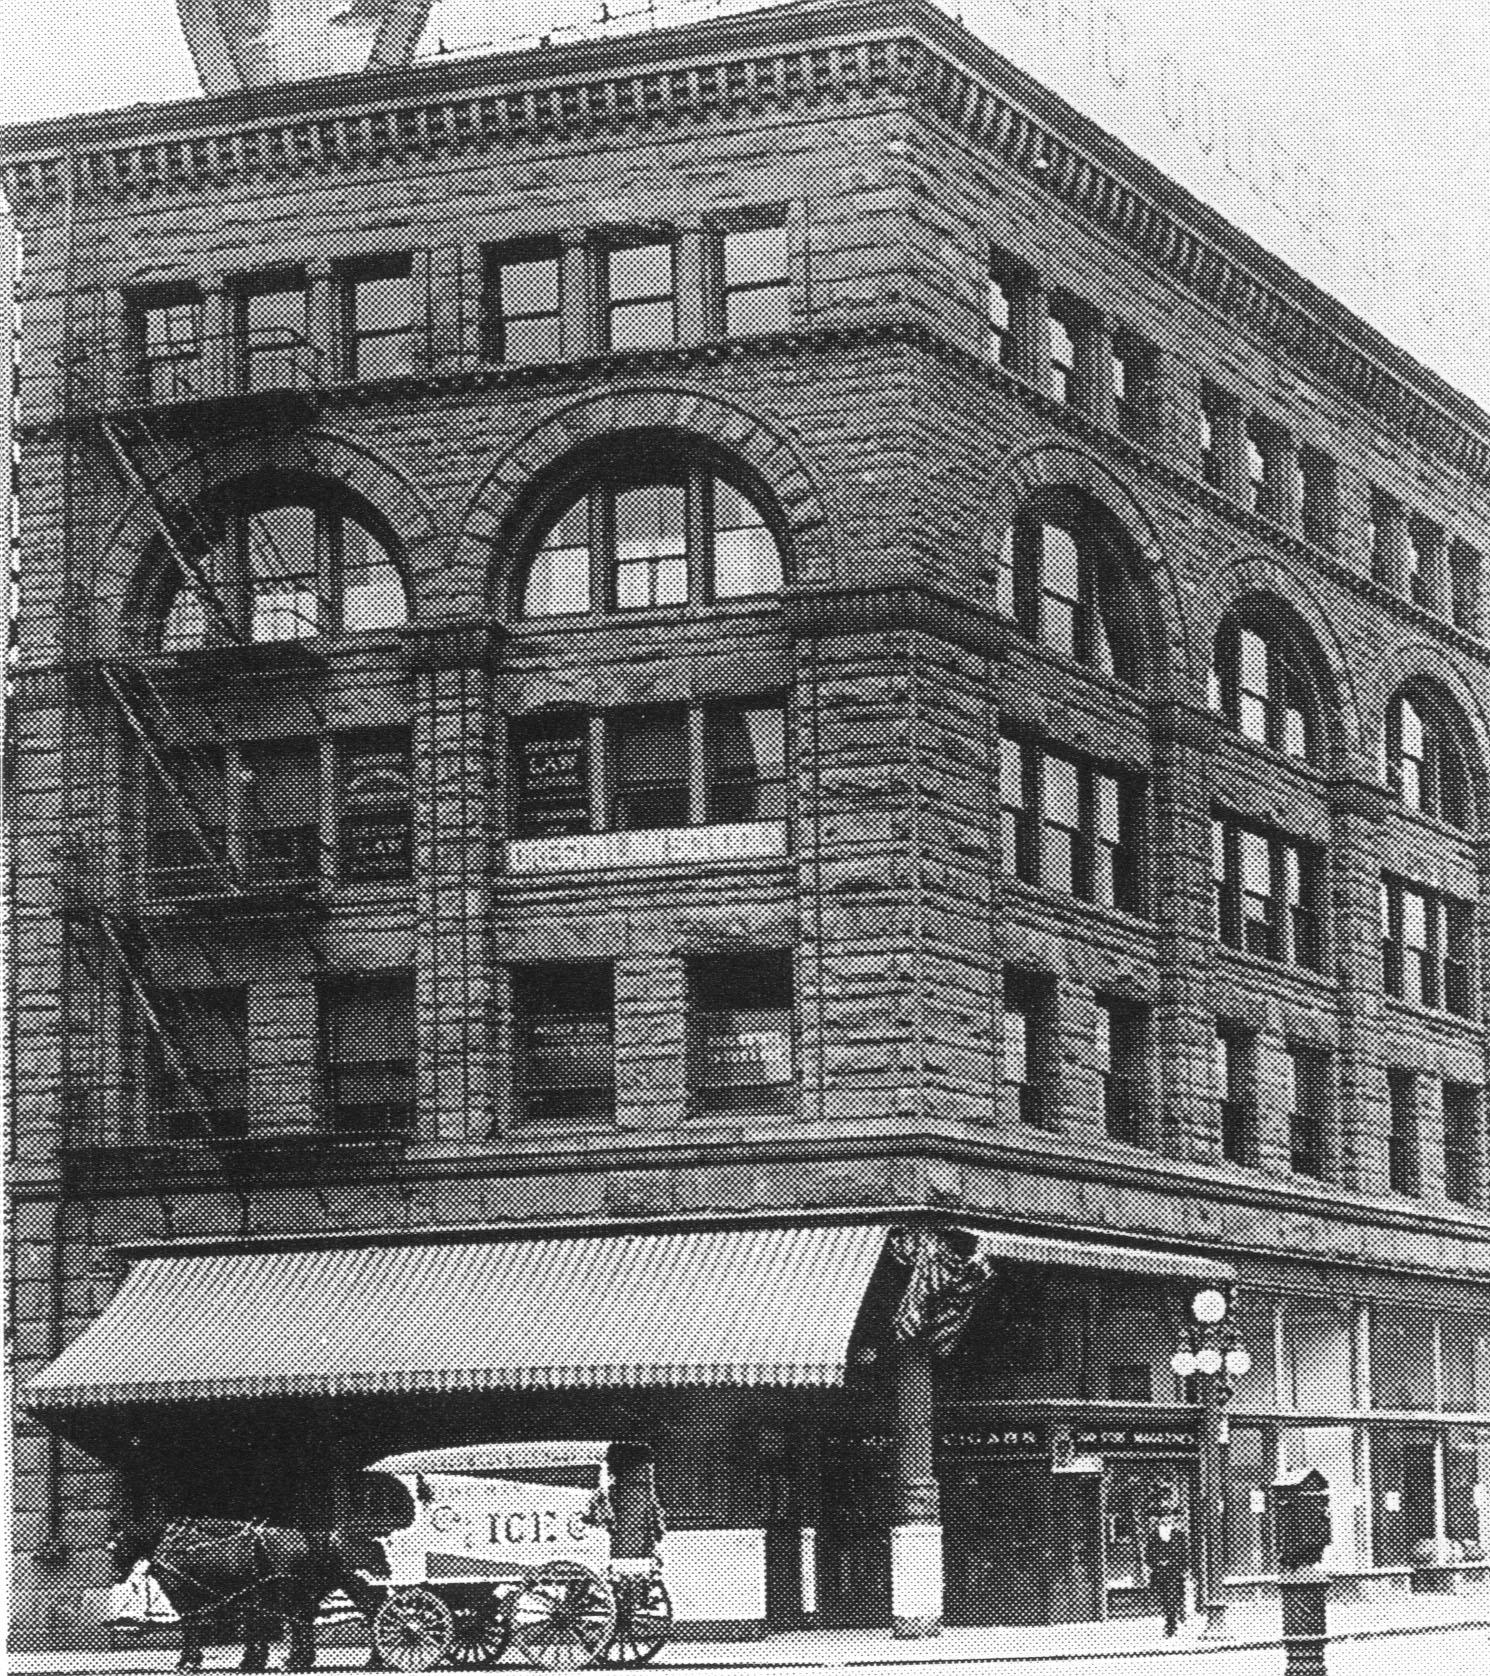 Drexel Building